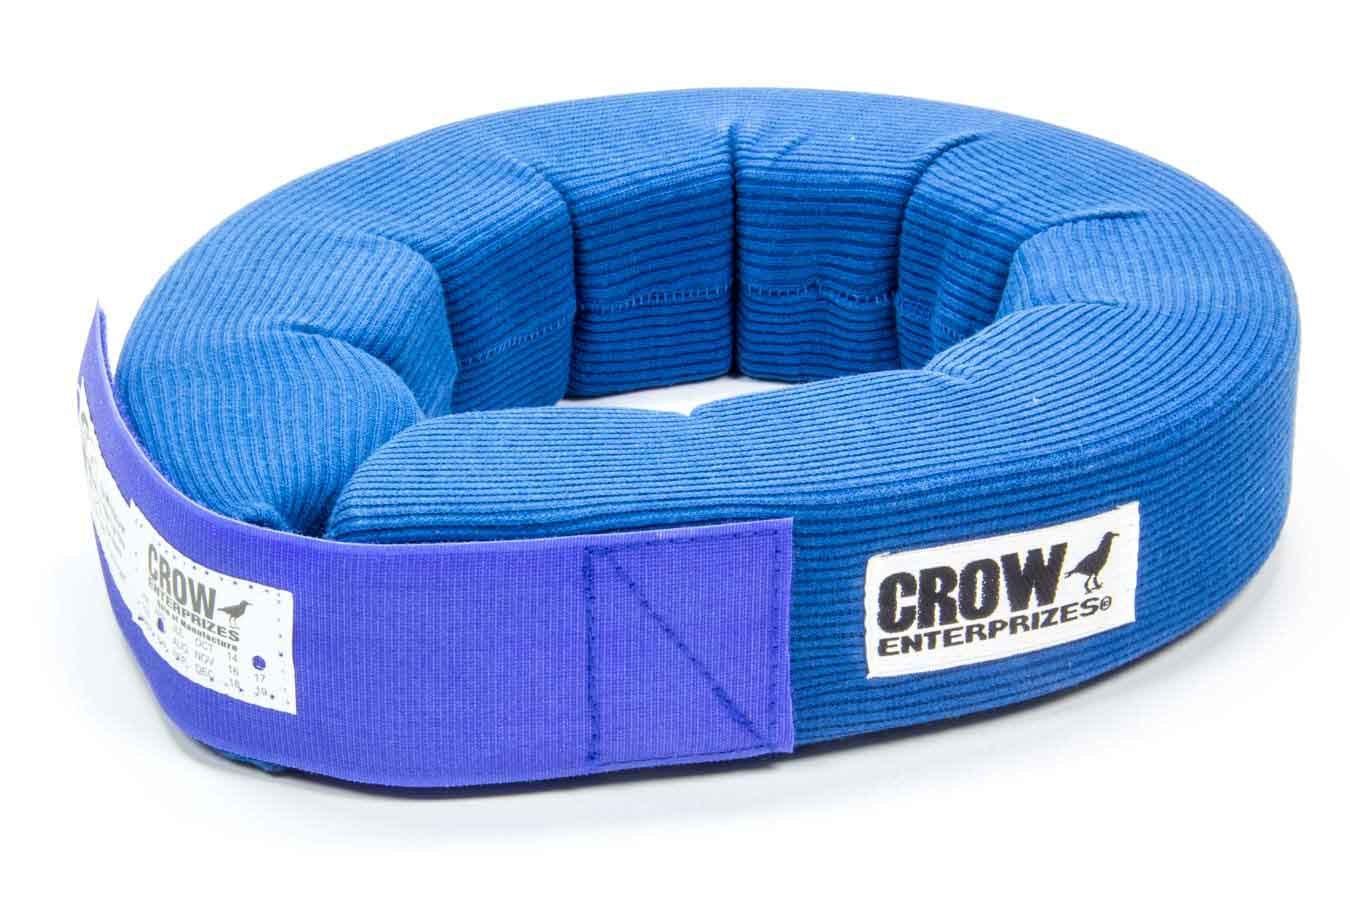 Crow Enterprizes Neck Collar Knitted 360 Degree Blue SFI 3.3